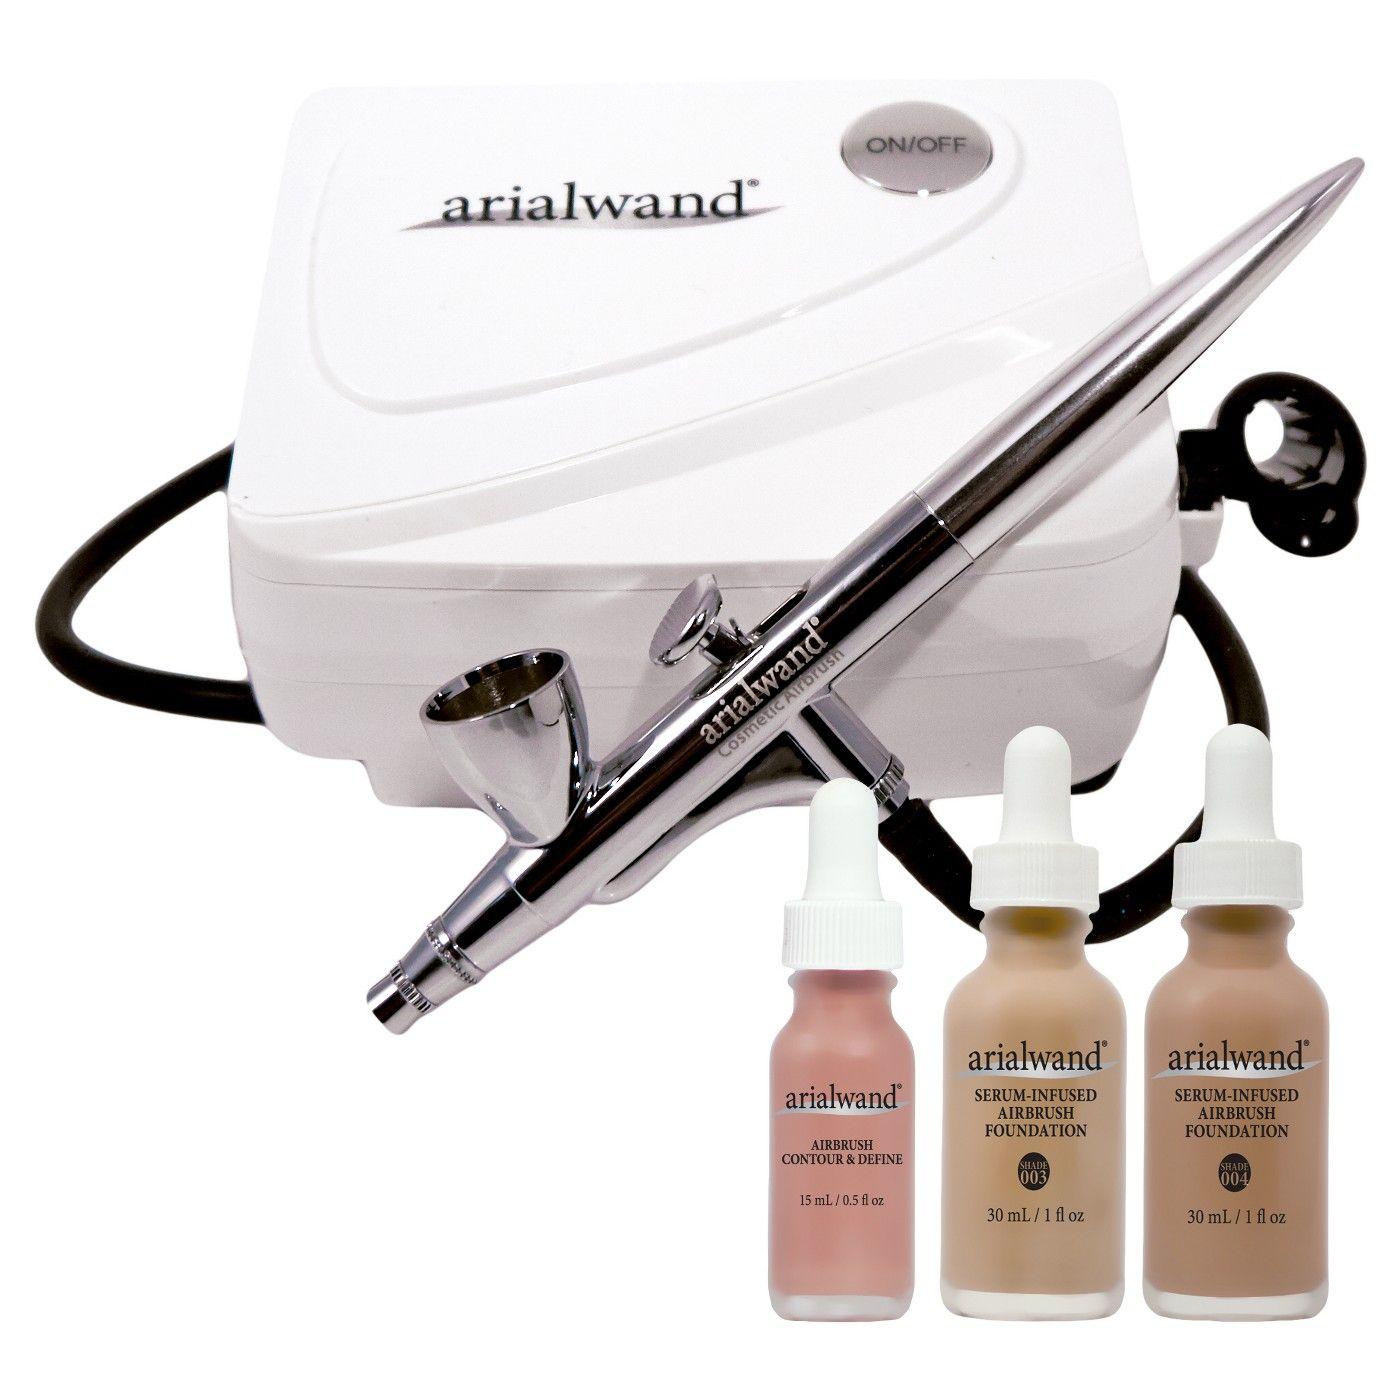 Arialwand airbrush kit with serum infused foundation 1